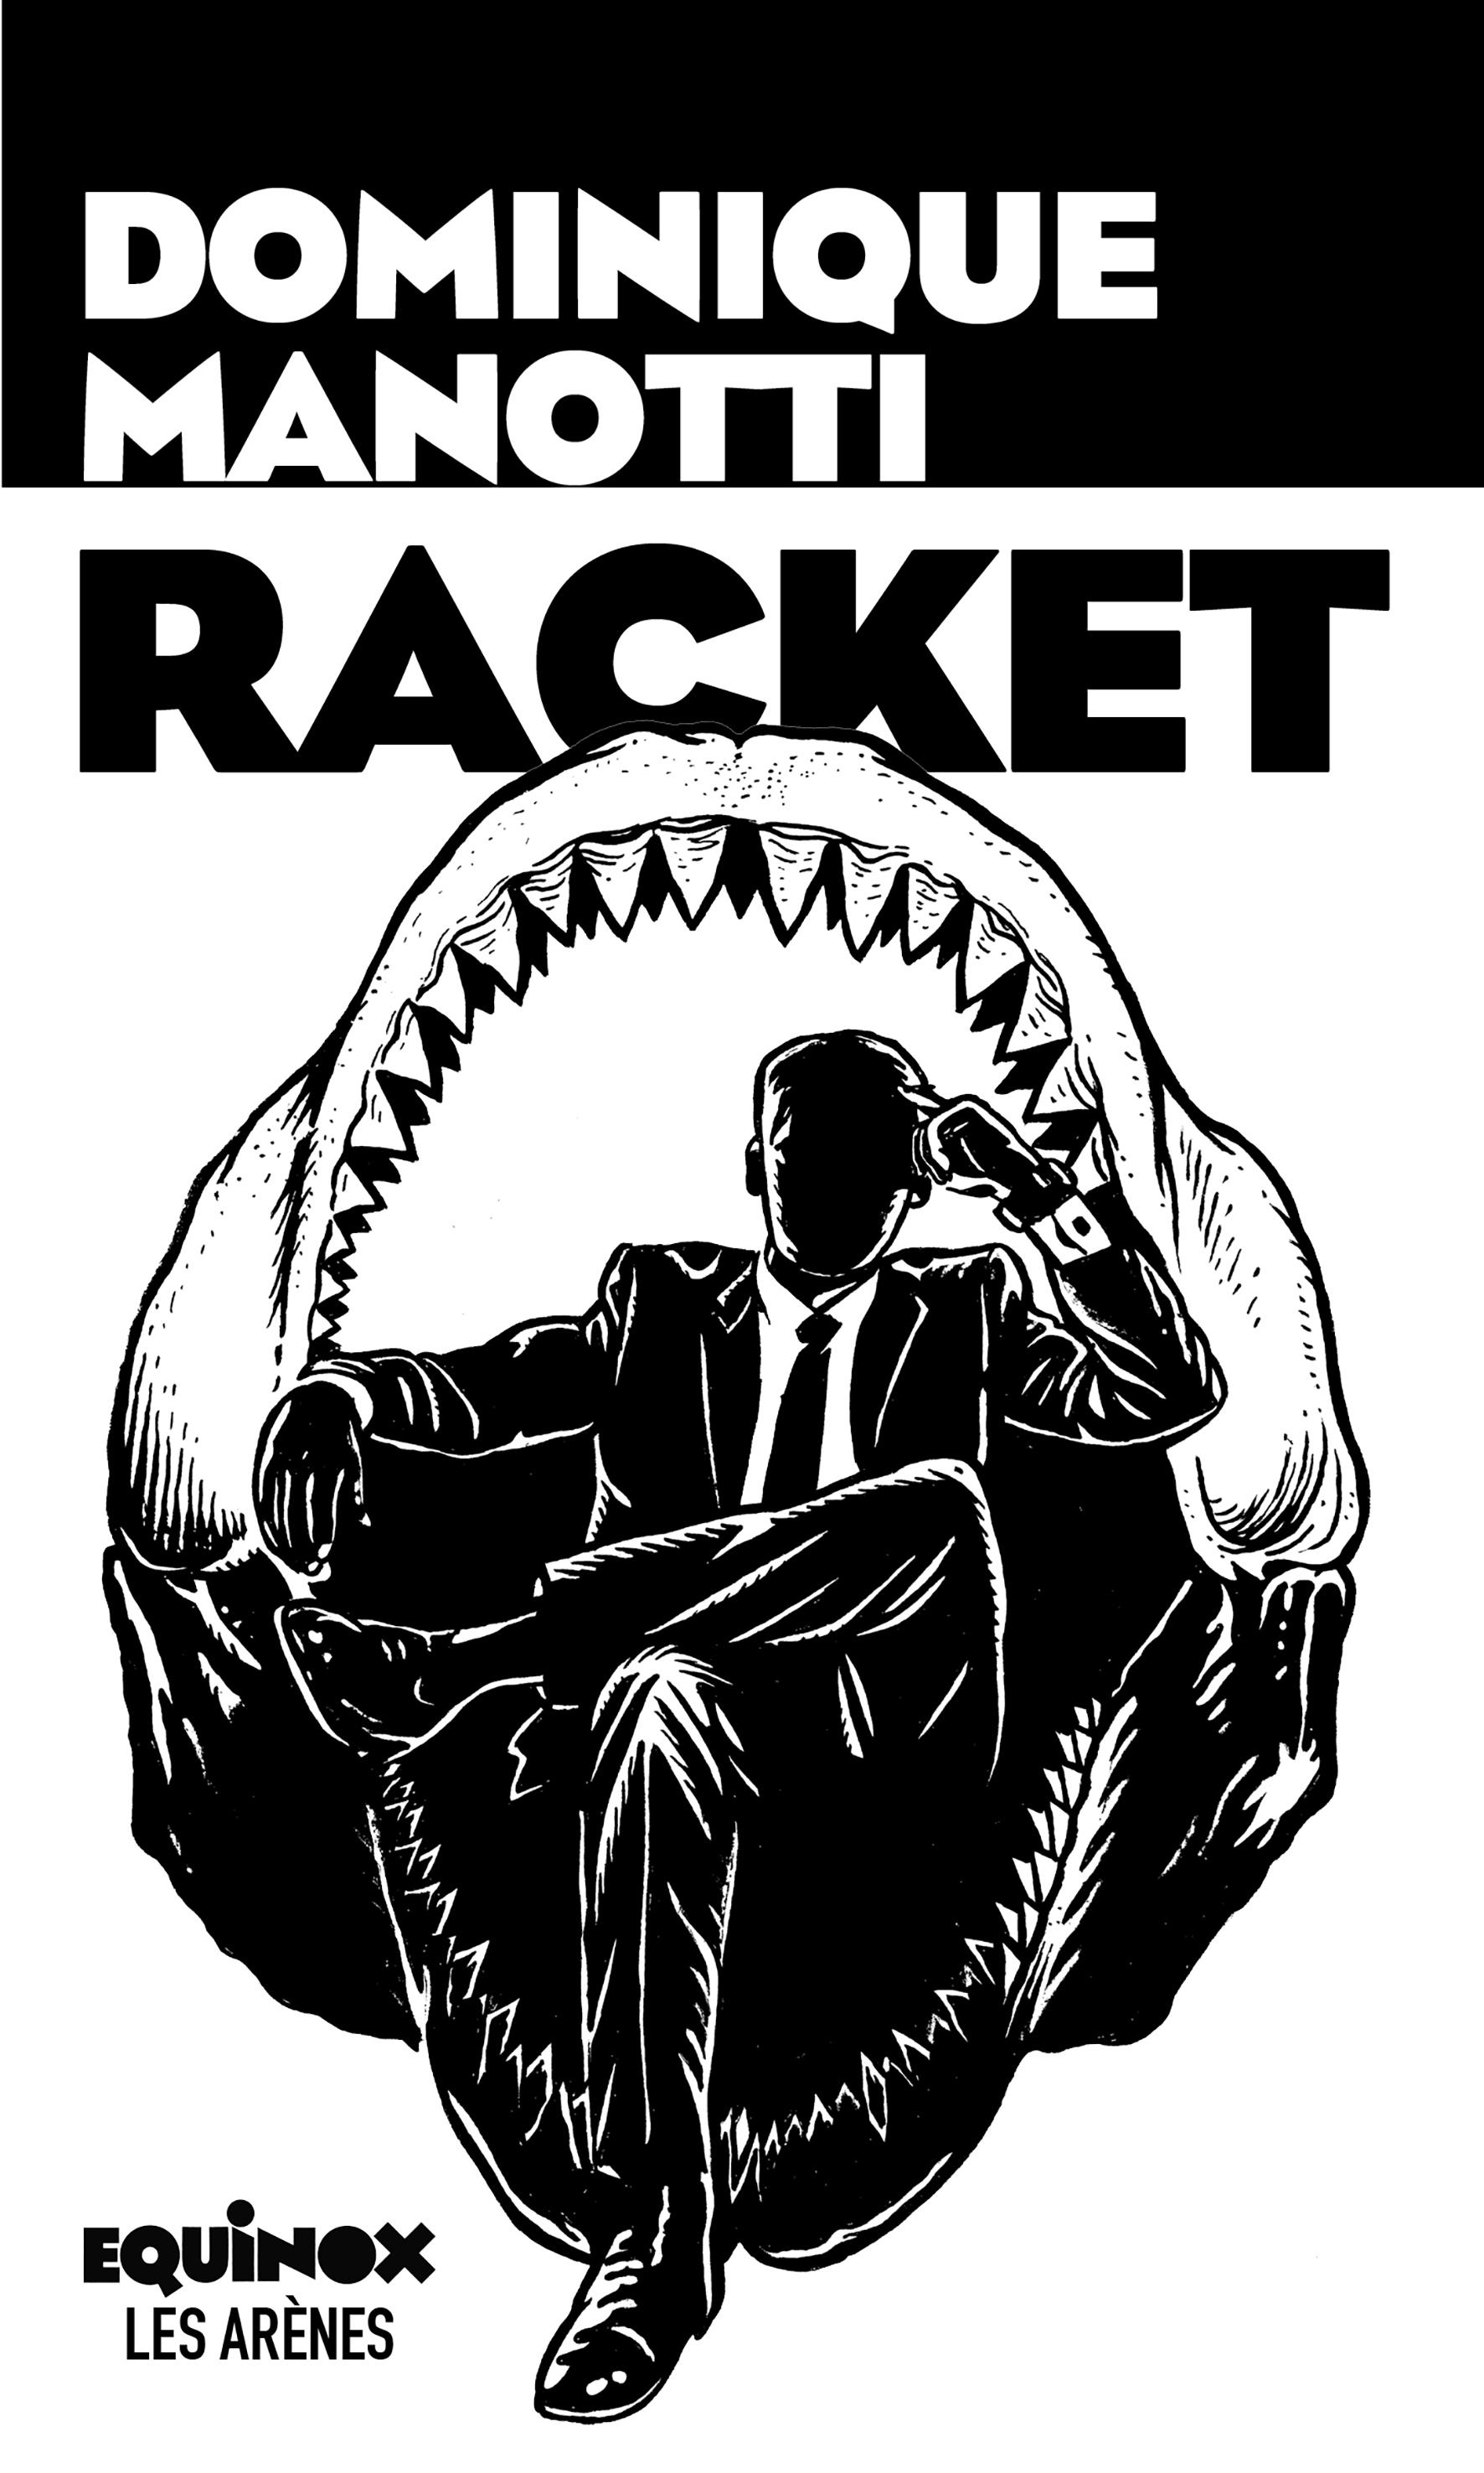 Racket | Manotti, Dominique